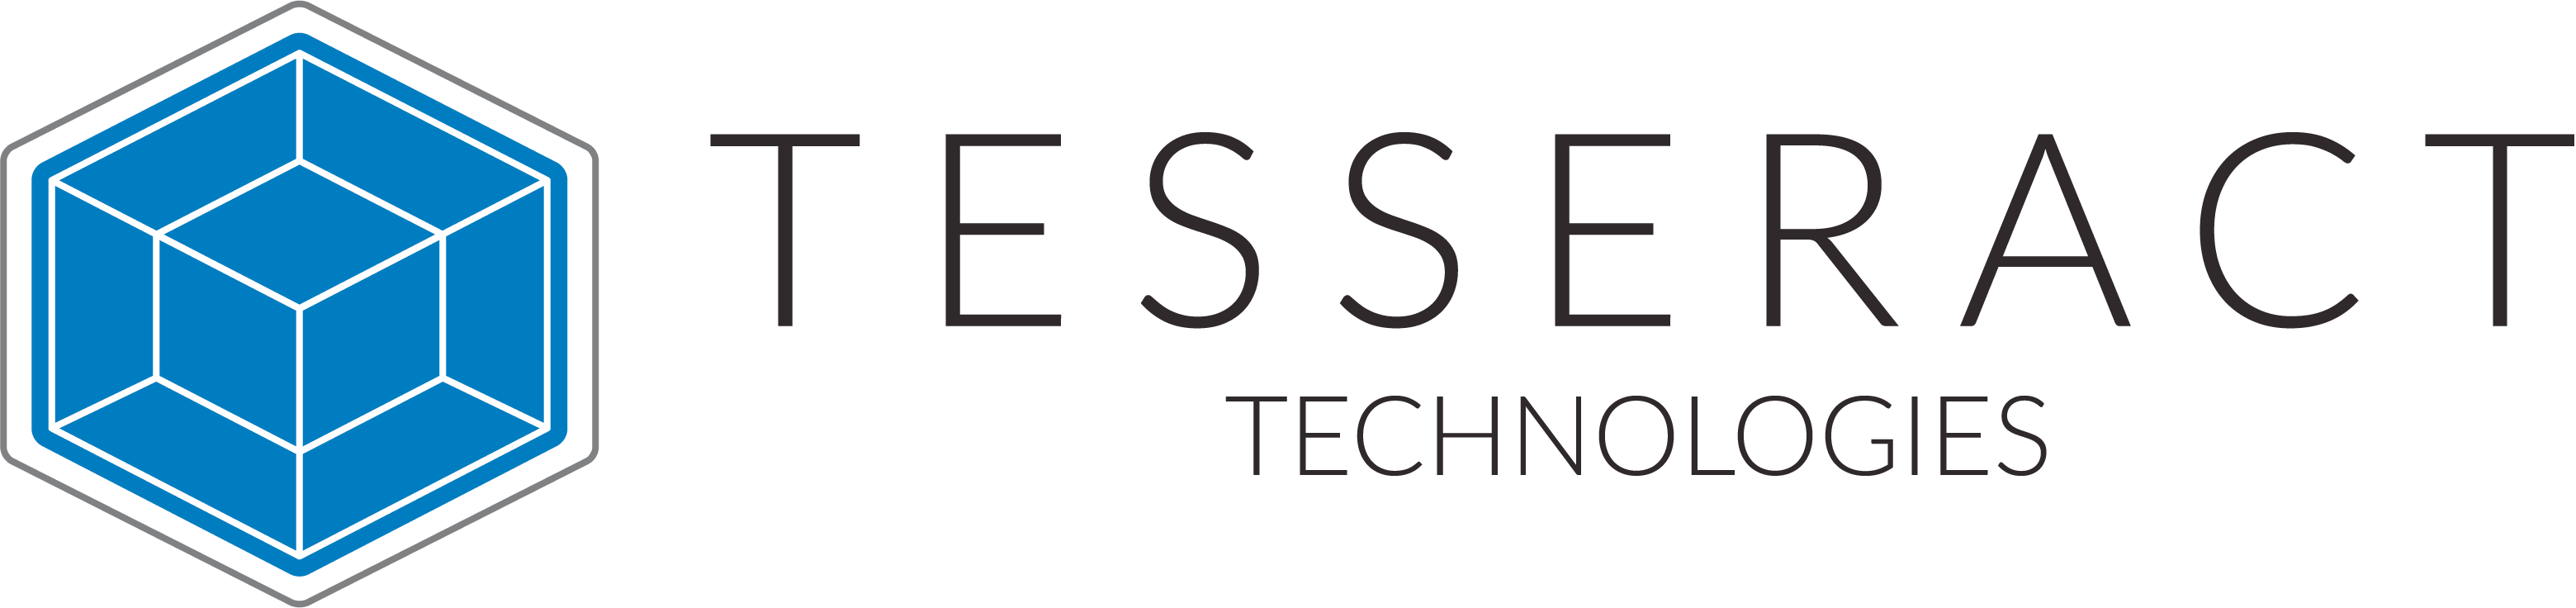 Tesseract Technologies